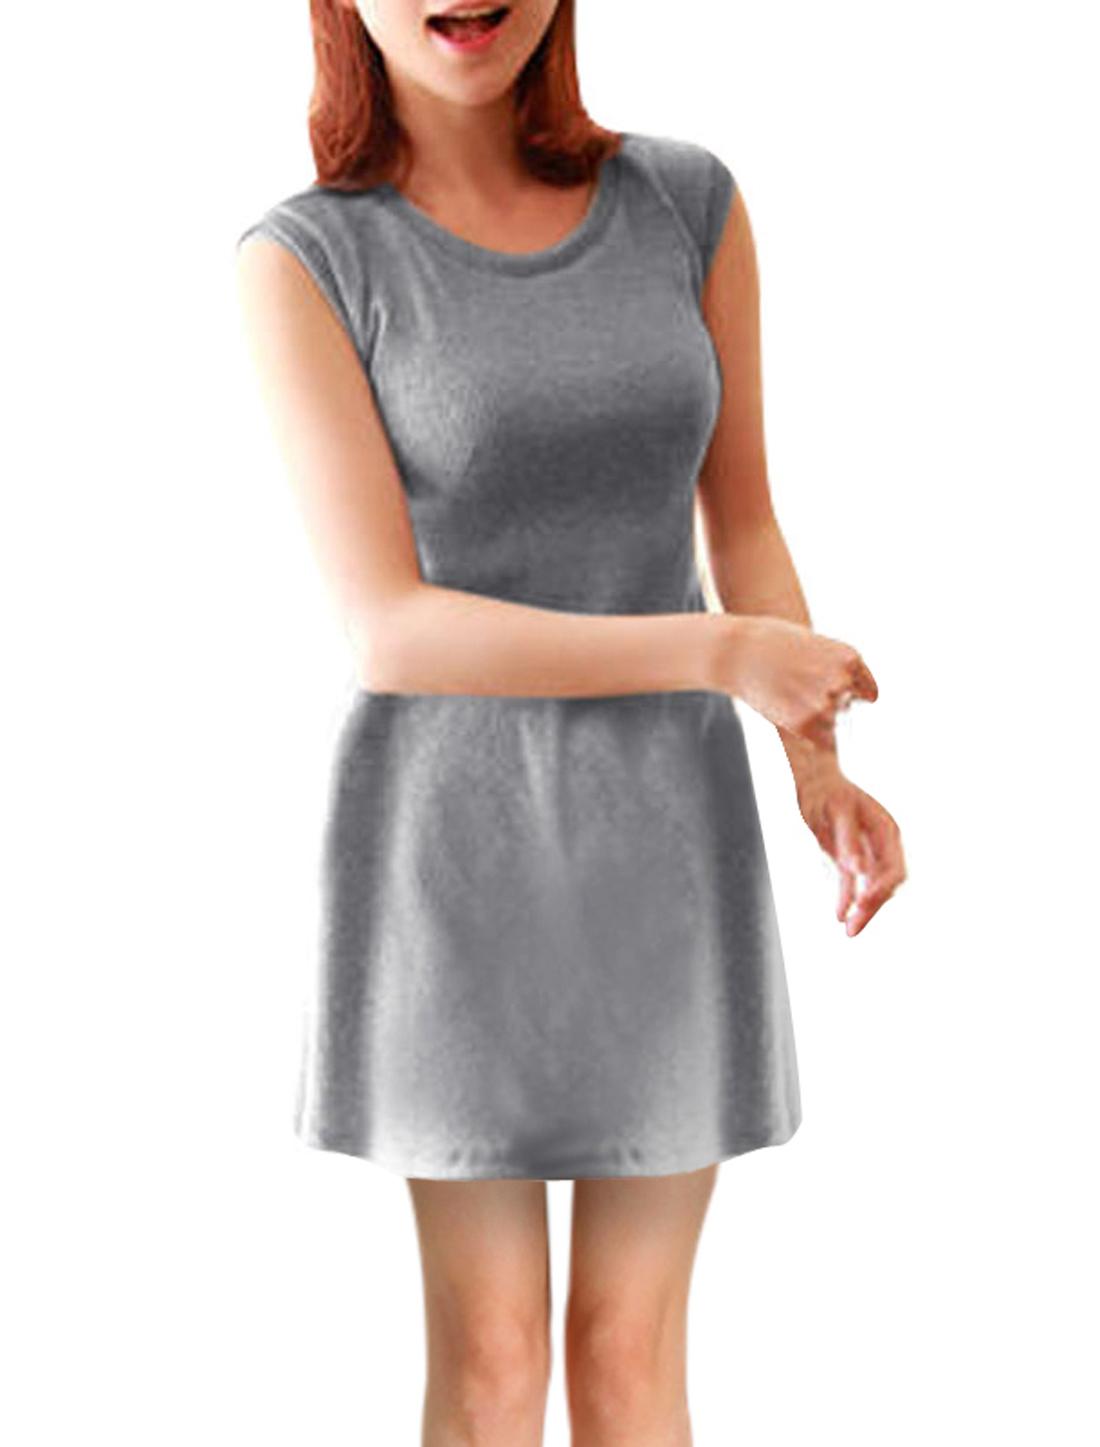 Women Slim Fit Round Neck Sleeveless Design Pullover Dress Grey XS